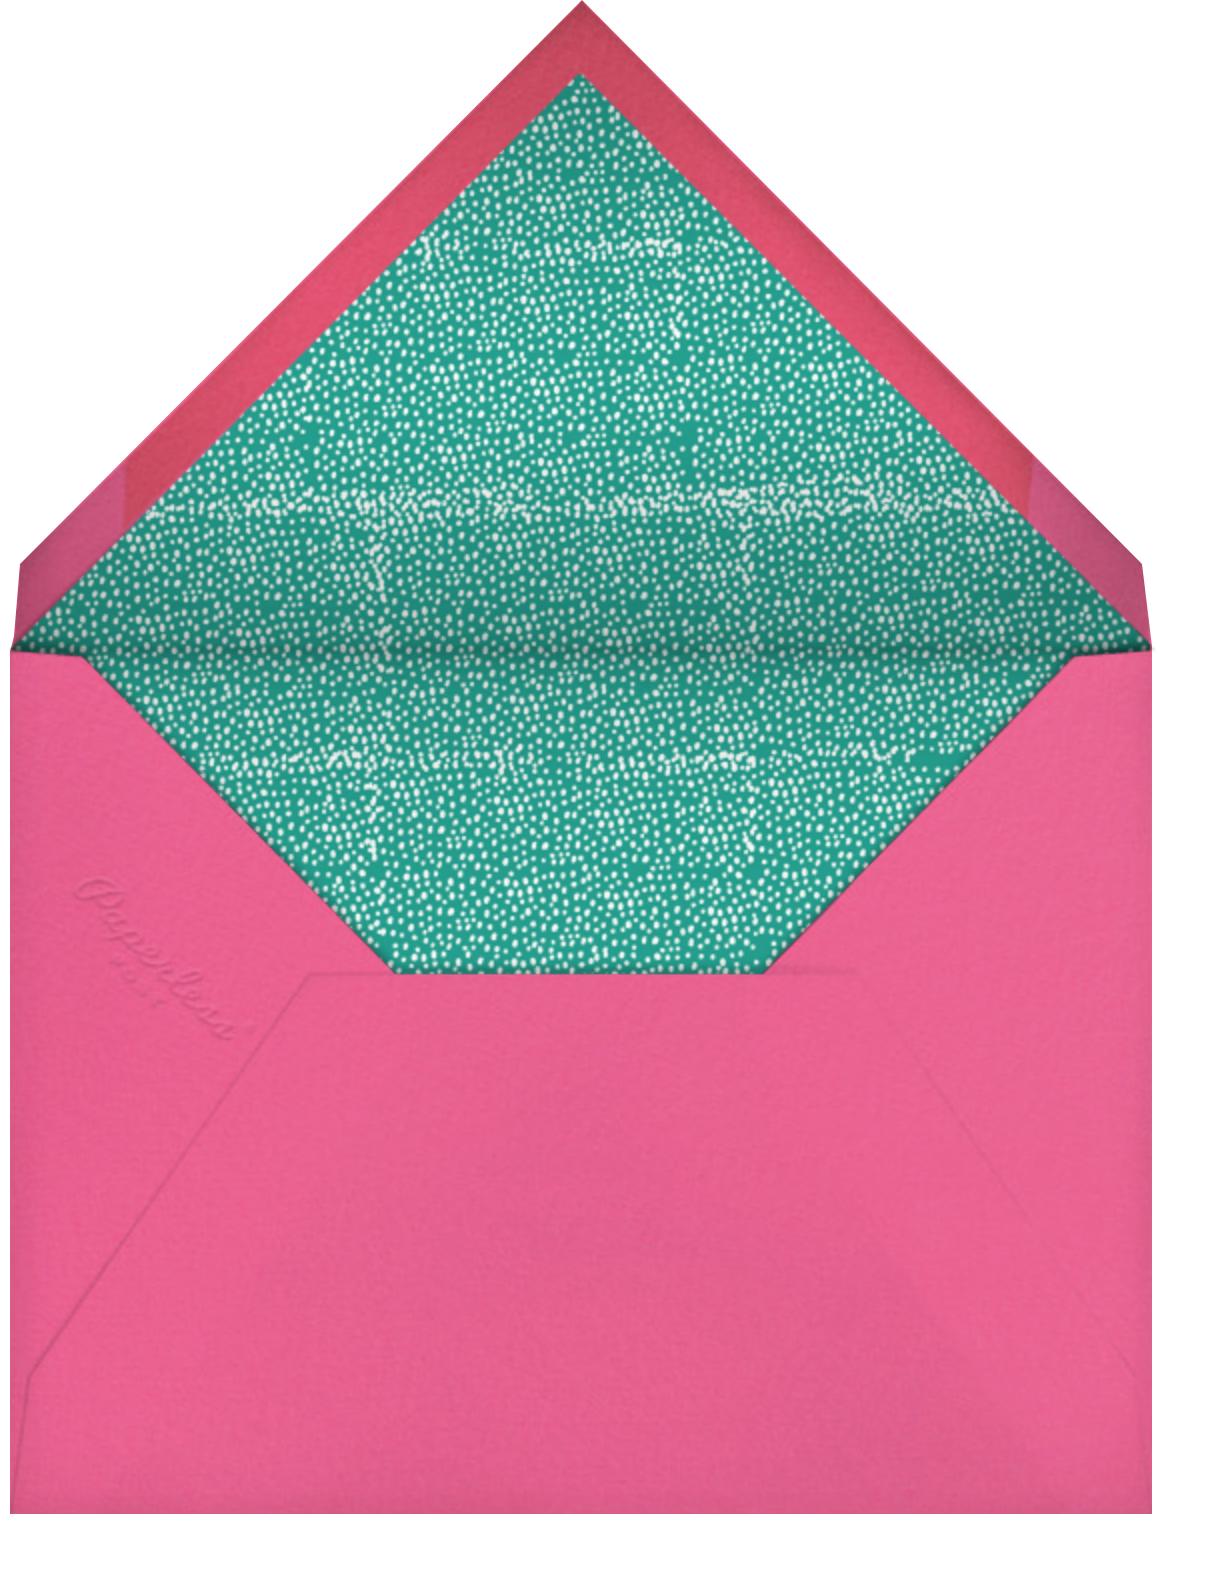 Mini Berlin (Photo) - Pink - Mr. Boddington's Studio - Kids' birthday - envelope back